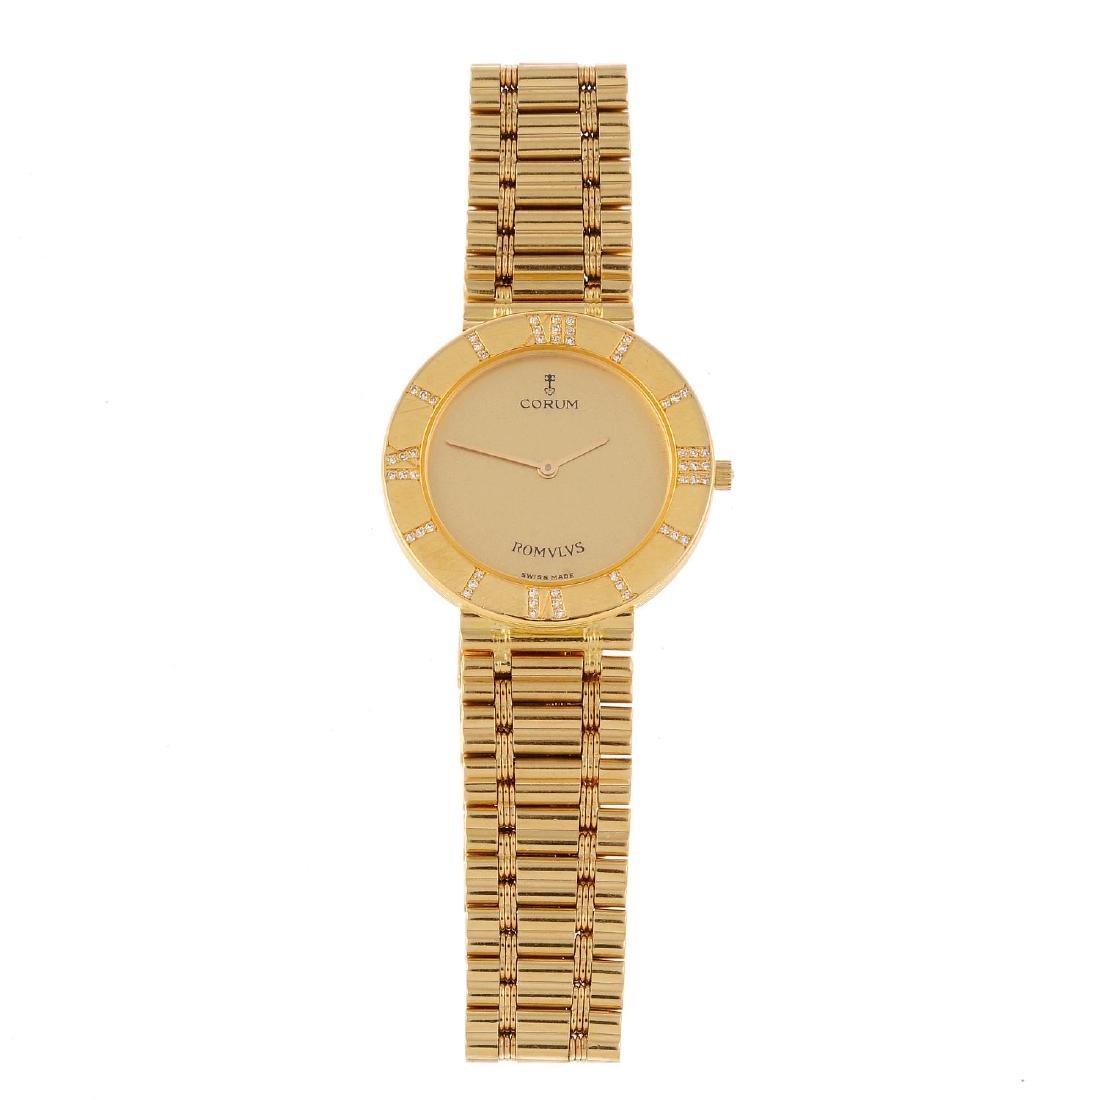 CORUM - a lady's Romulus bracelet watch. 18ct yellow